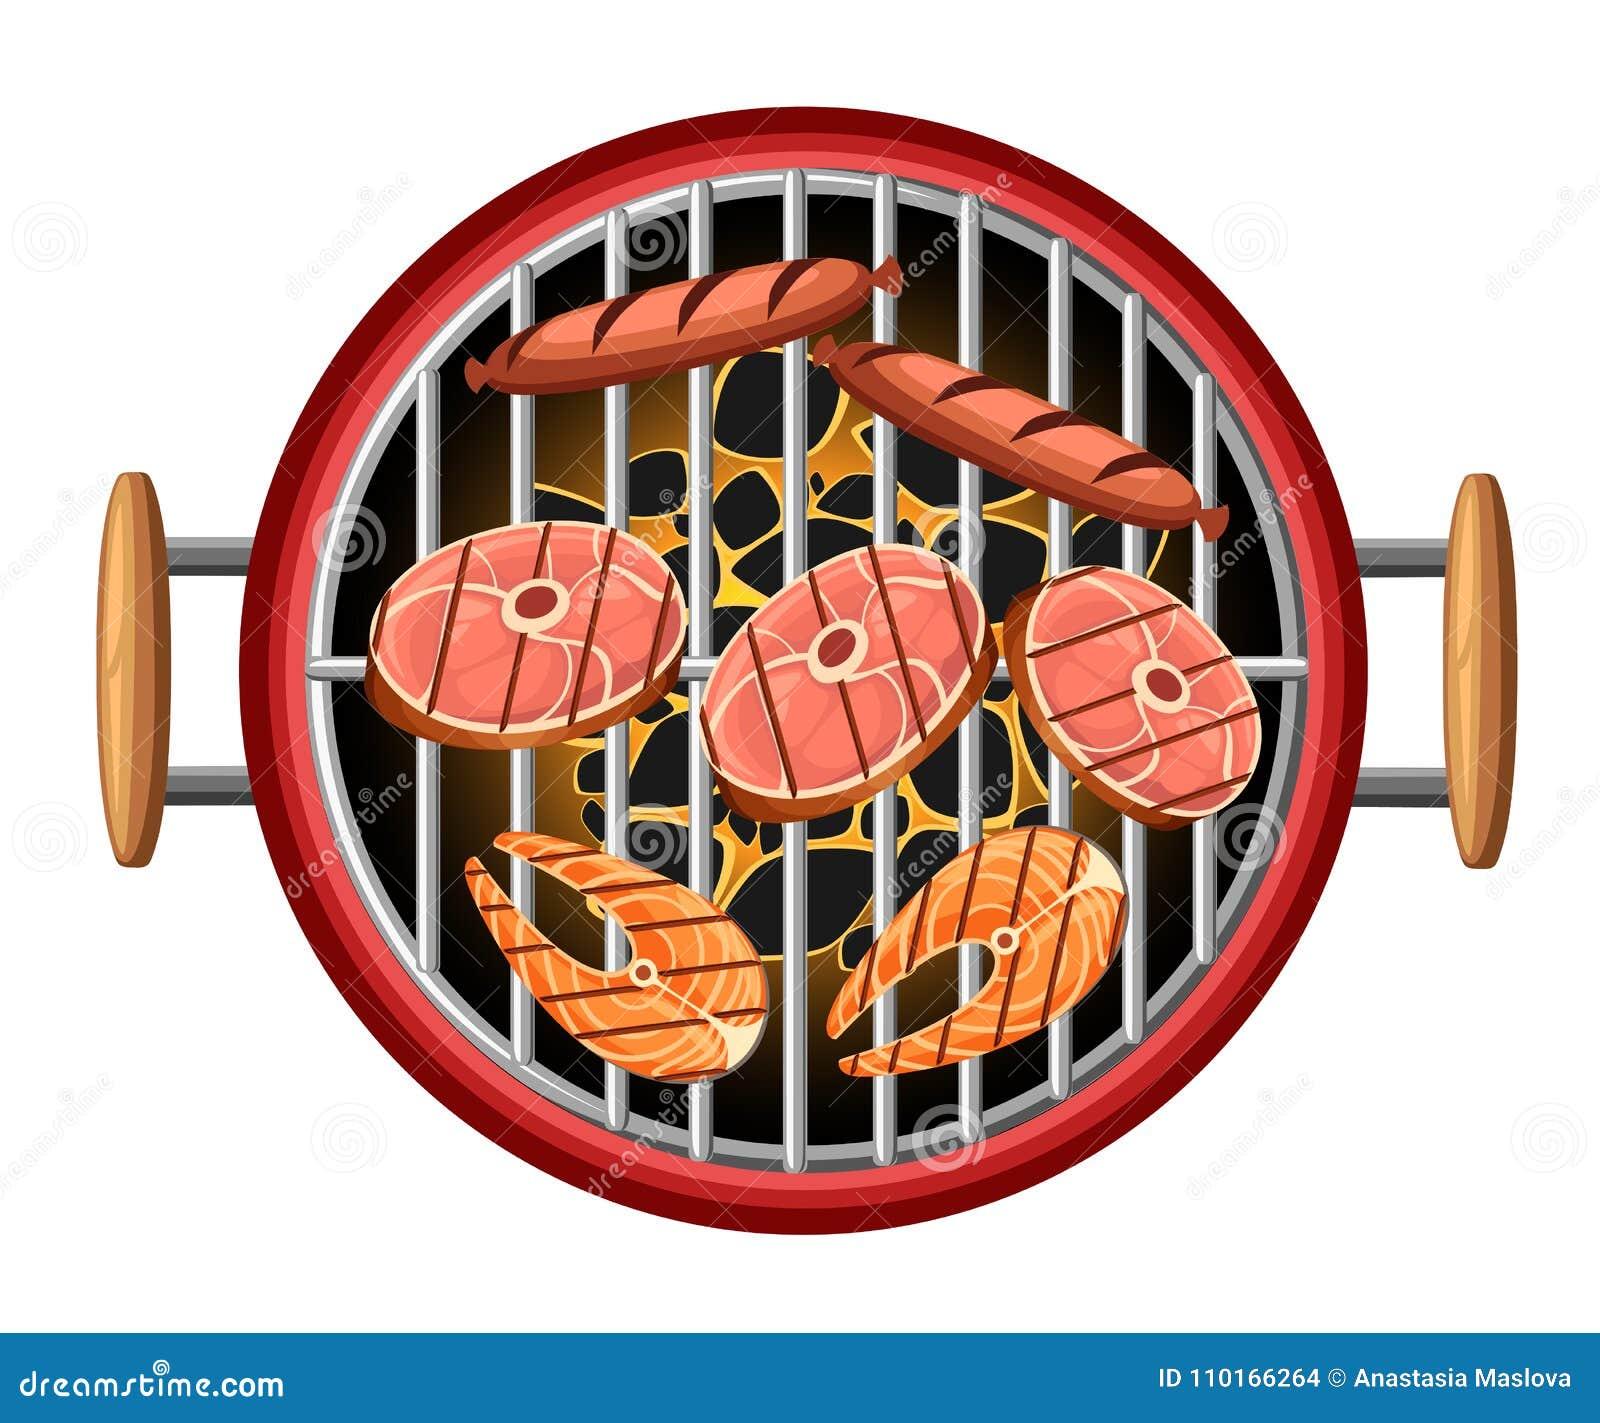 Barbecue Design Elements Grill Top View Burning Coals Bbq ...